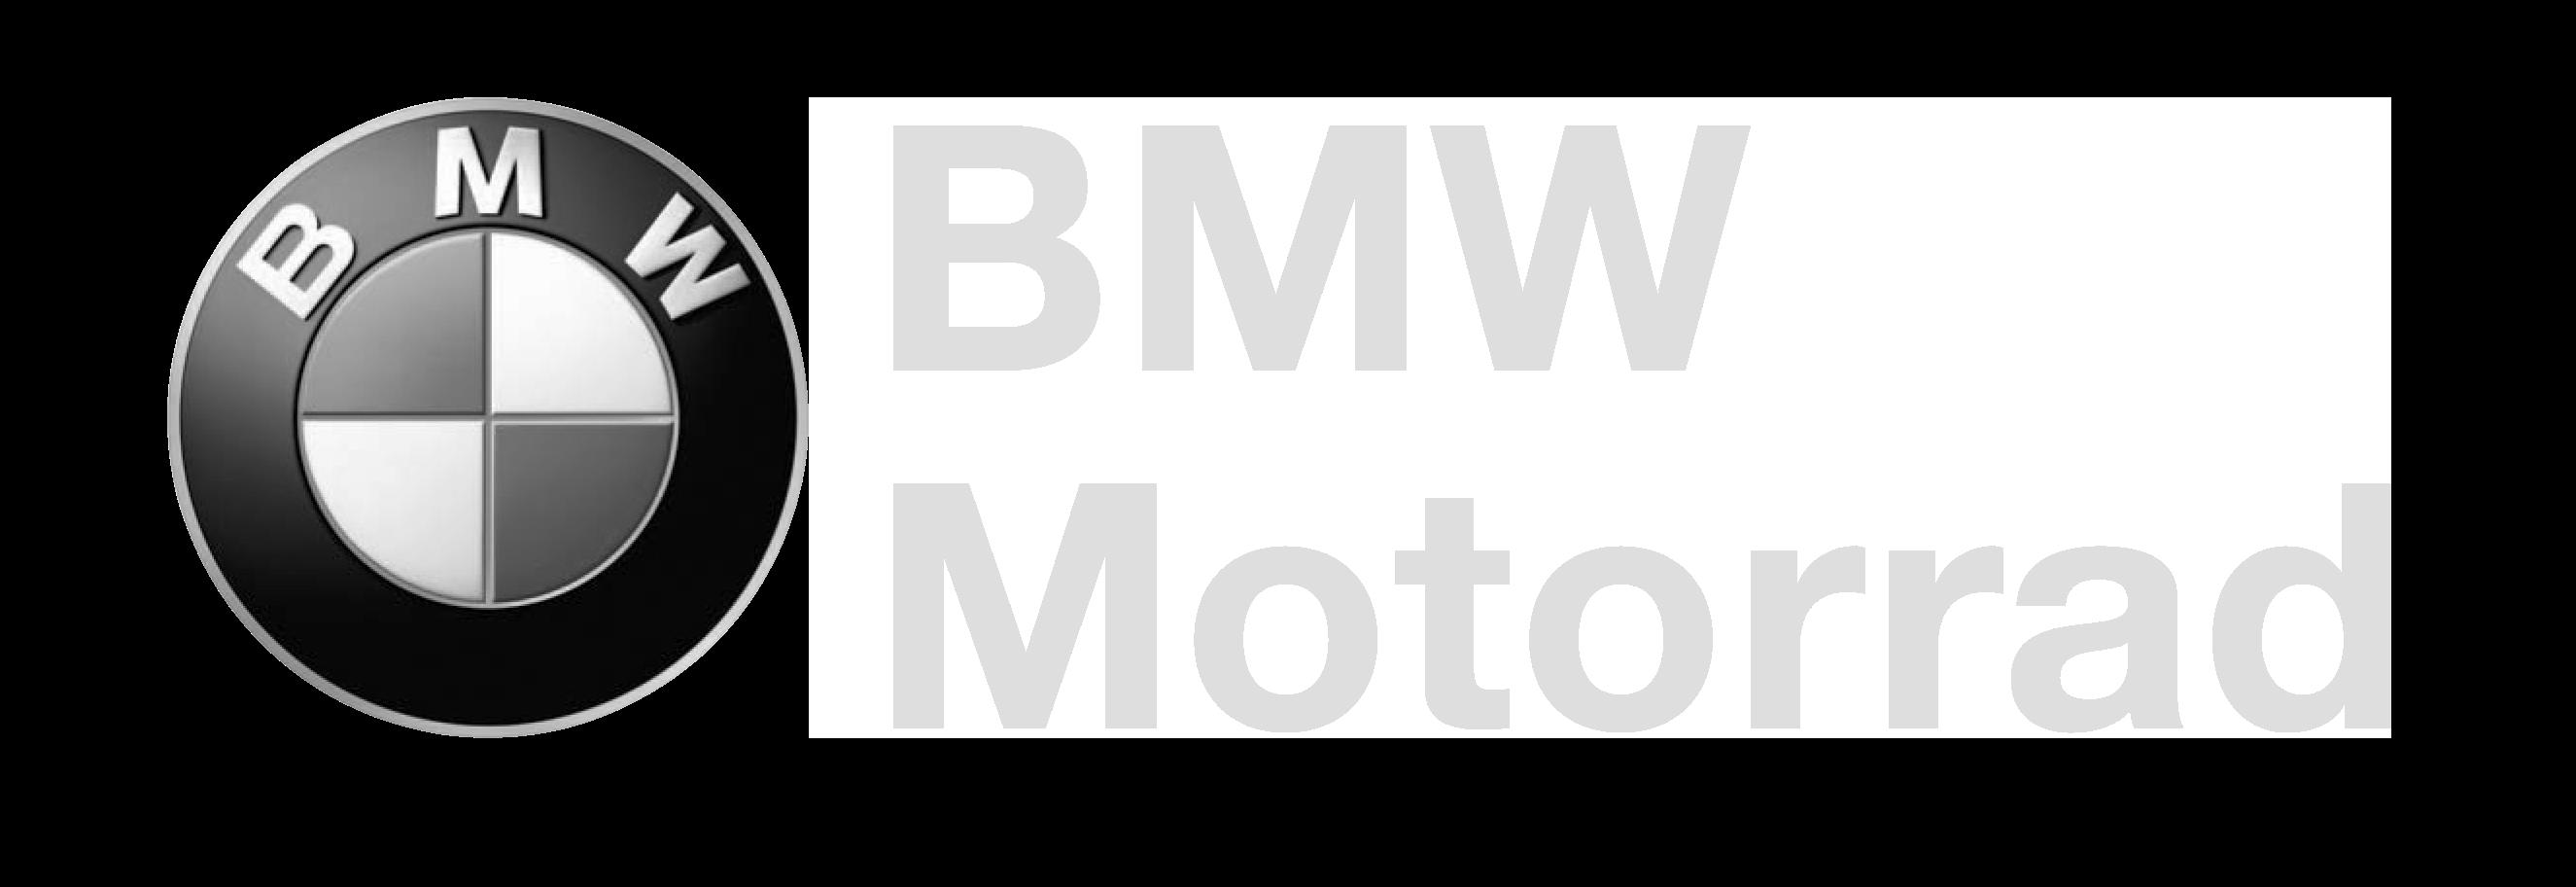 BMW_Motorrad_edit